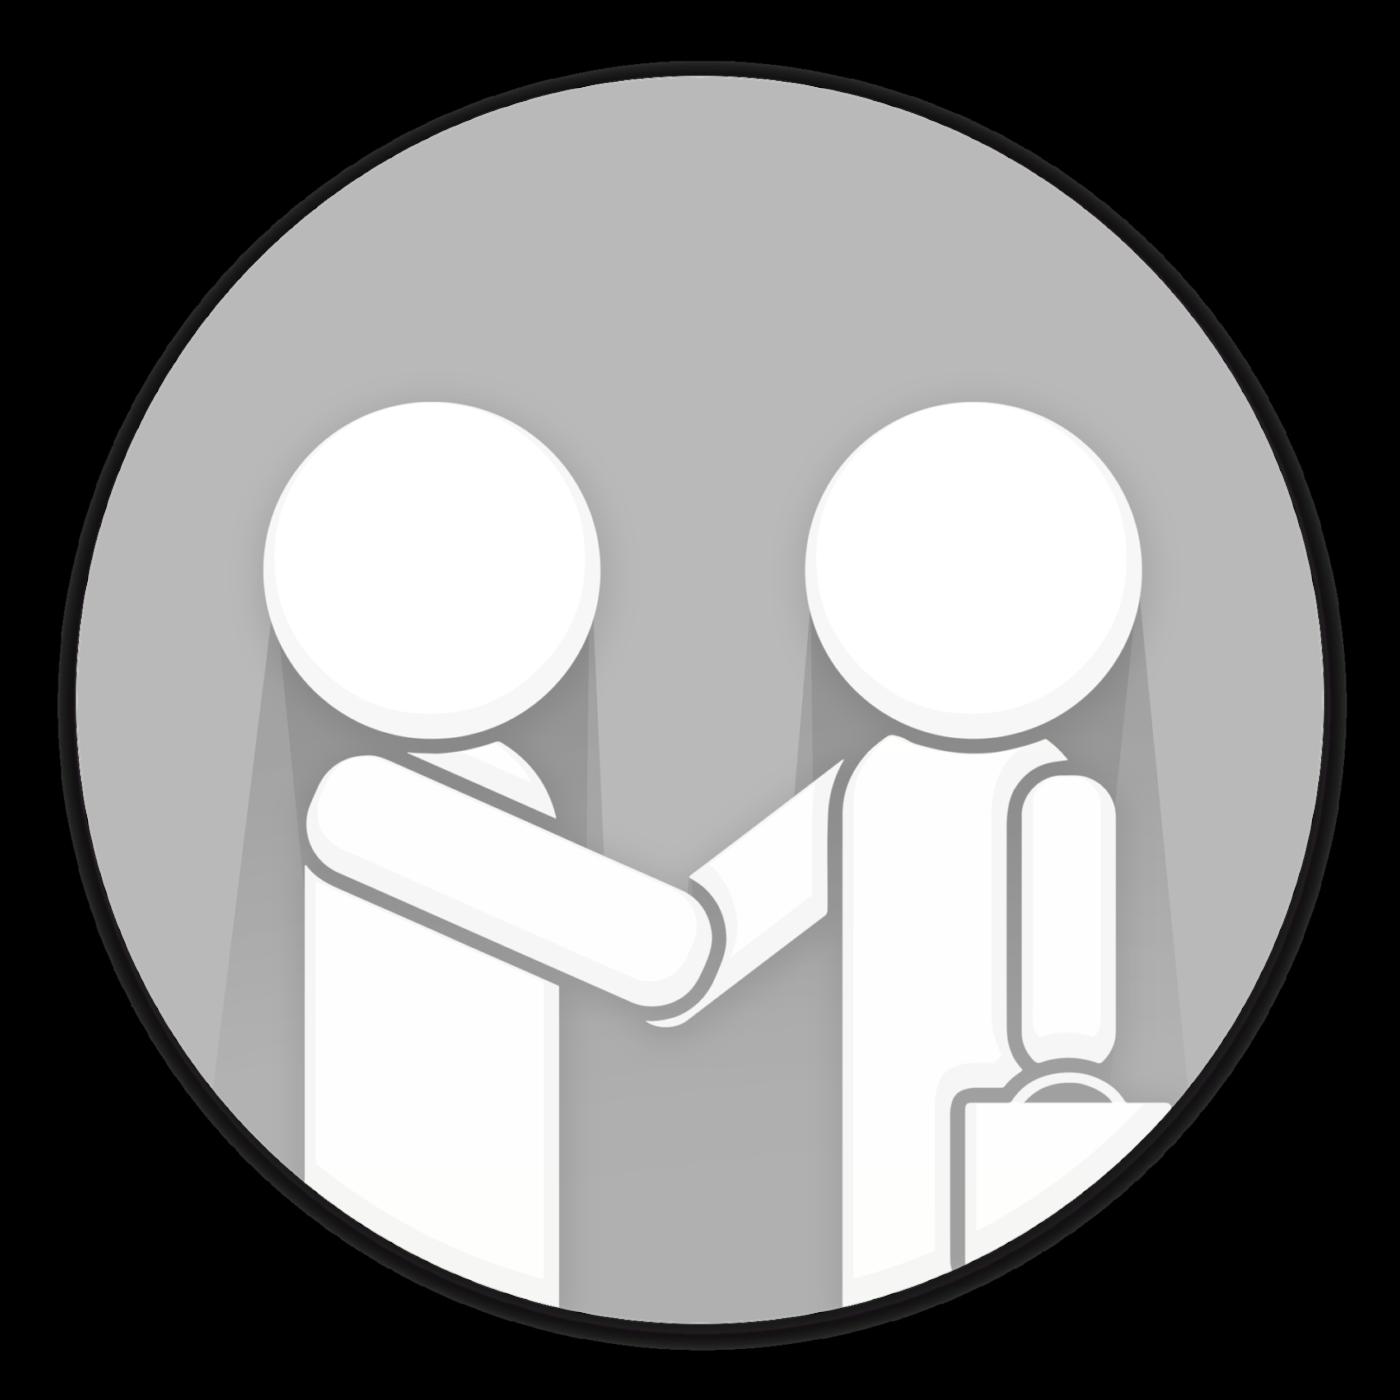 customer-service-1433641_1920